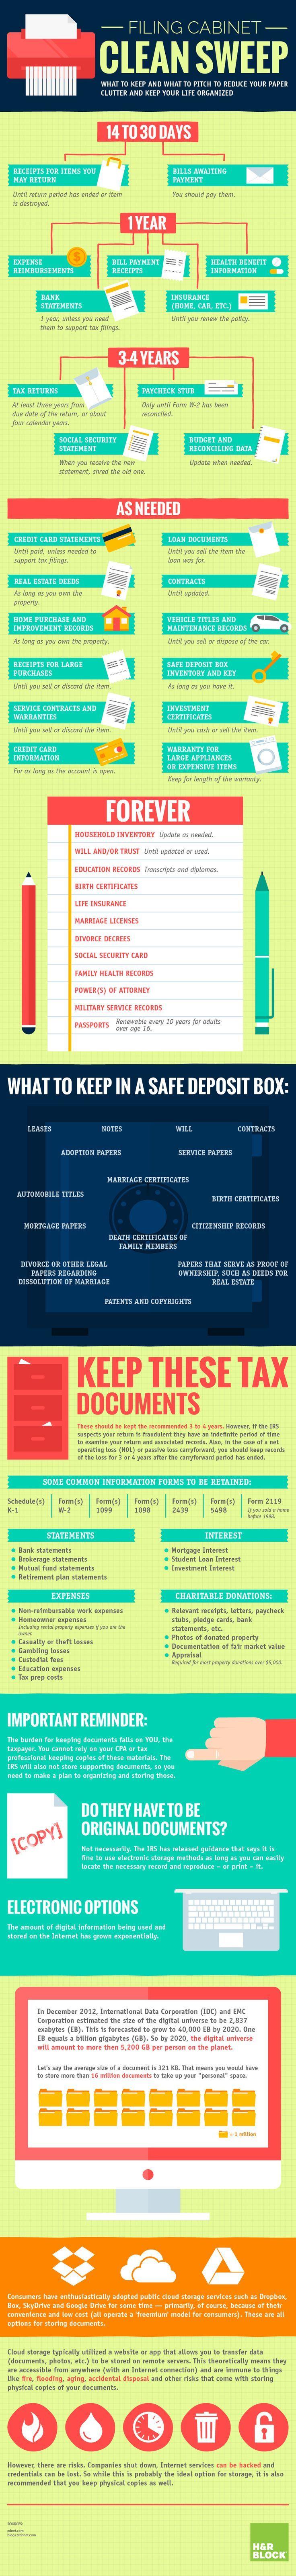 Scrapbook paper organization ideas - File Cabinet Clean Up Organizing Manualsorganizing Family Paperworkbusiness